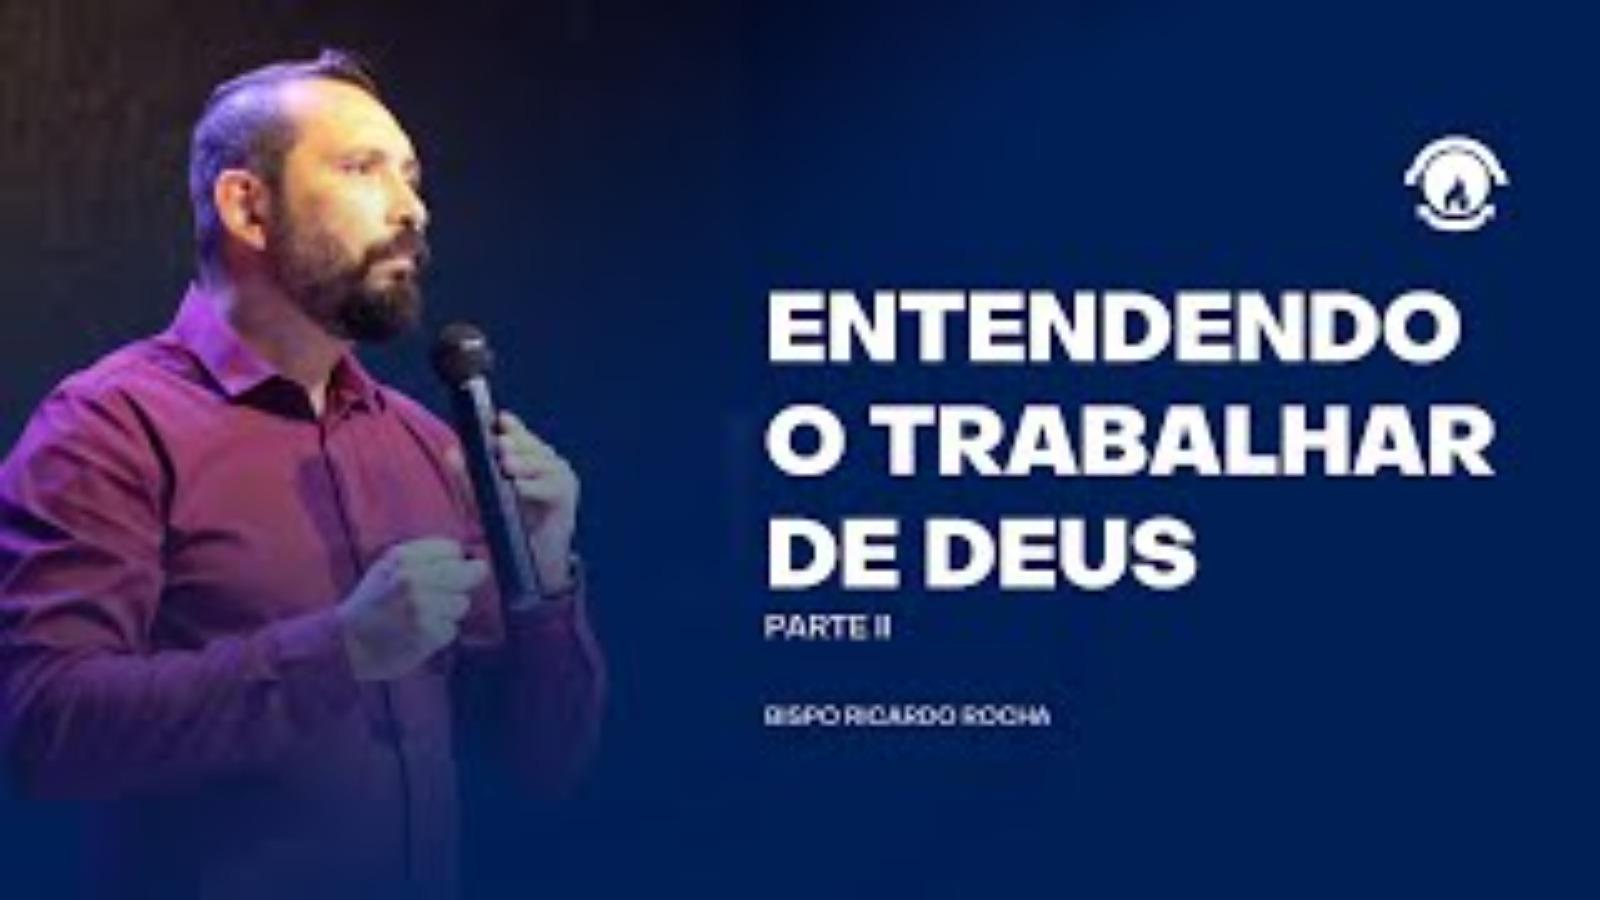 ENTENDENDO O TRABALHAR DE DEUS - PARTE II